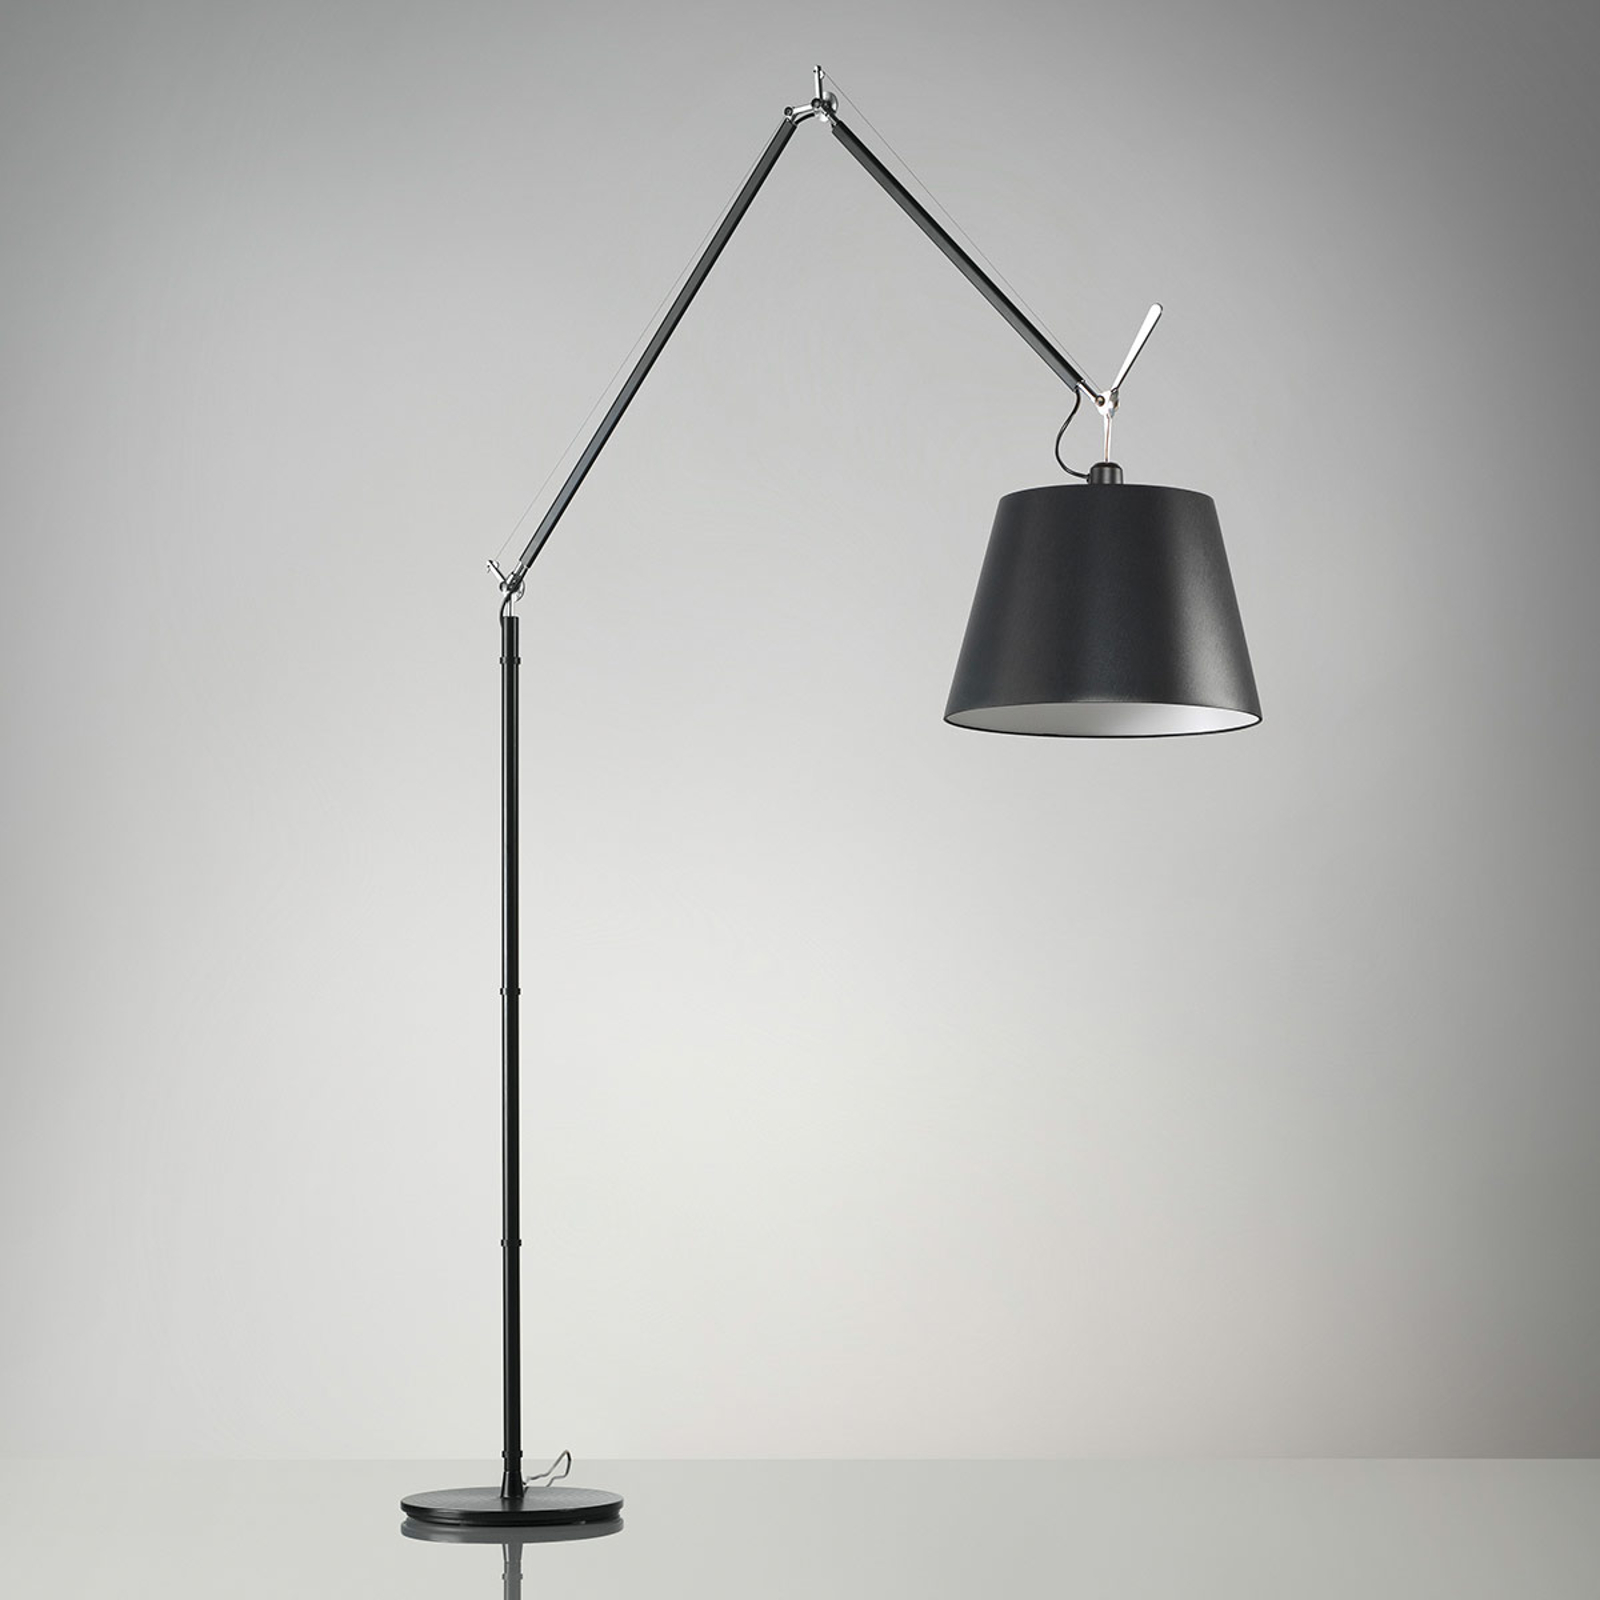 Artemide Tolomeo Mega lampadaire 3000K Ø 32cm